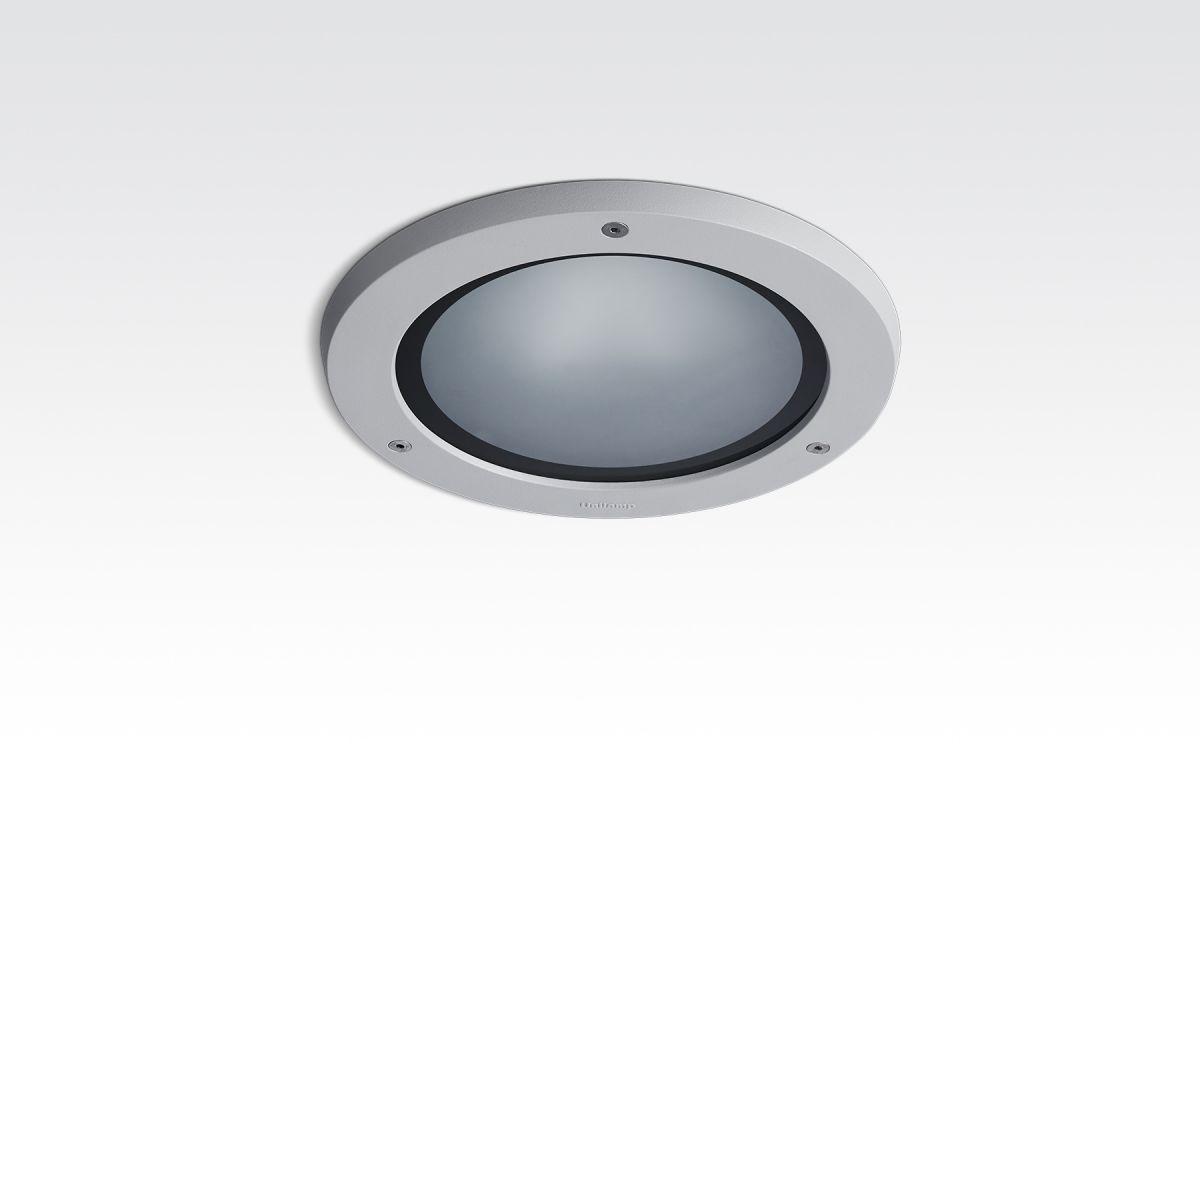 Maxi TUBE - Recess Downlight / Frost Glass